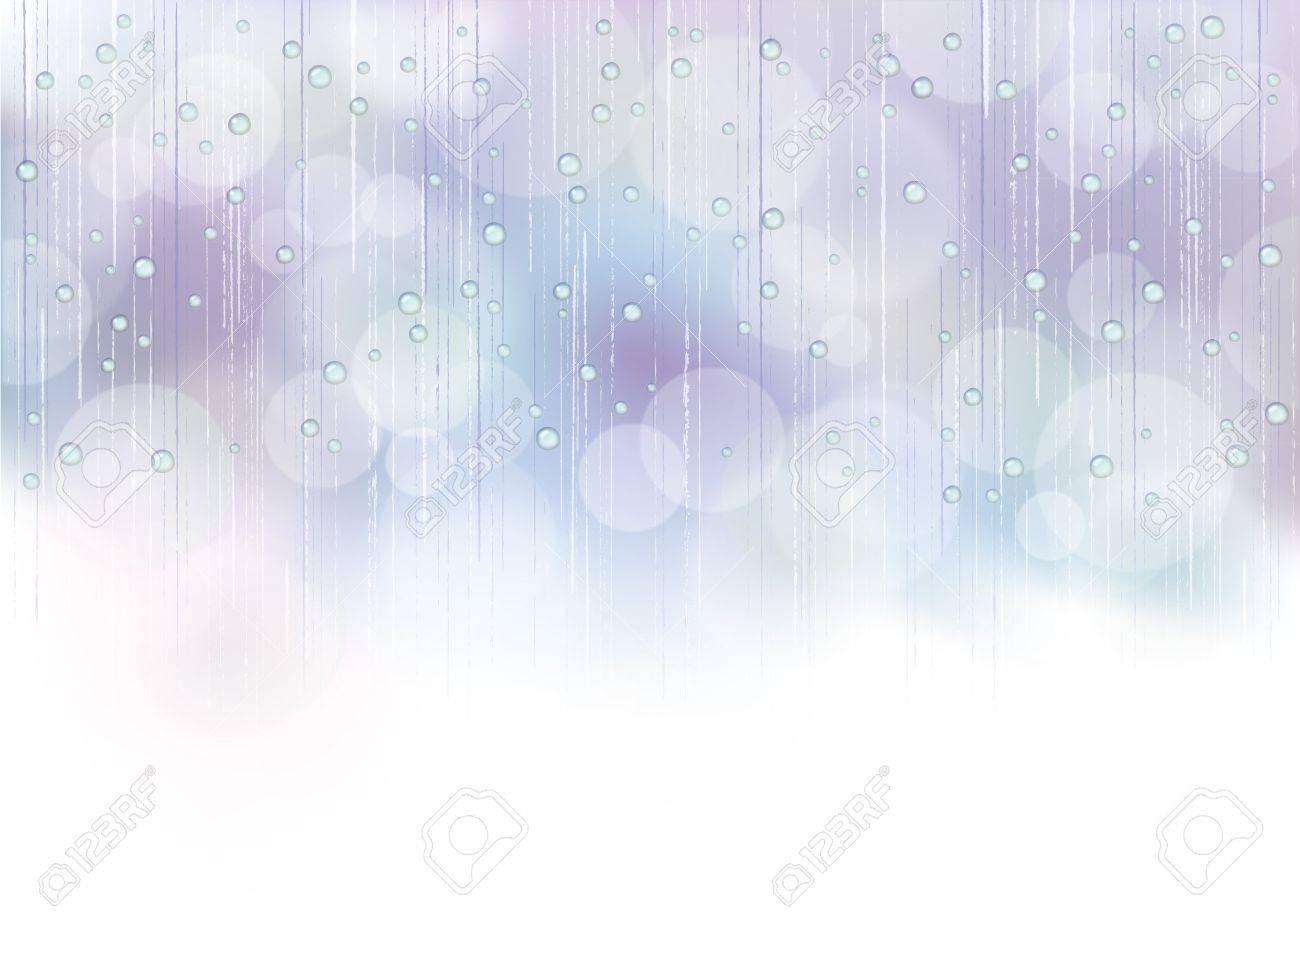 blue_rain Foto de archivo - 18254345